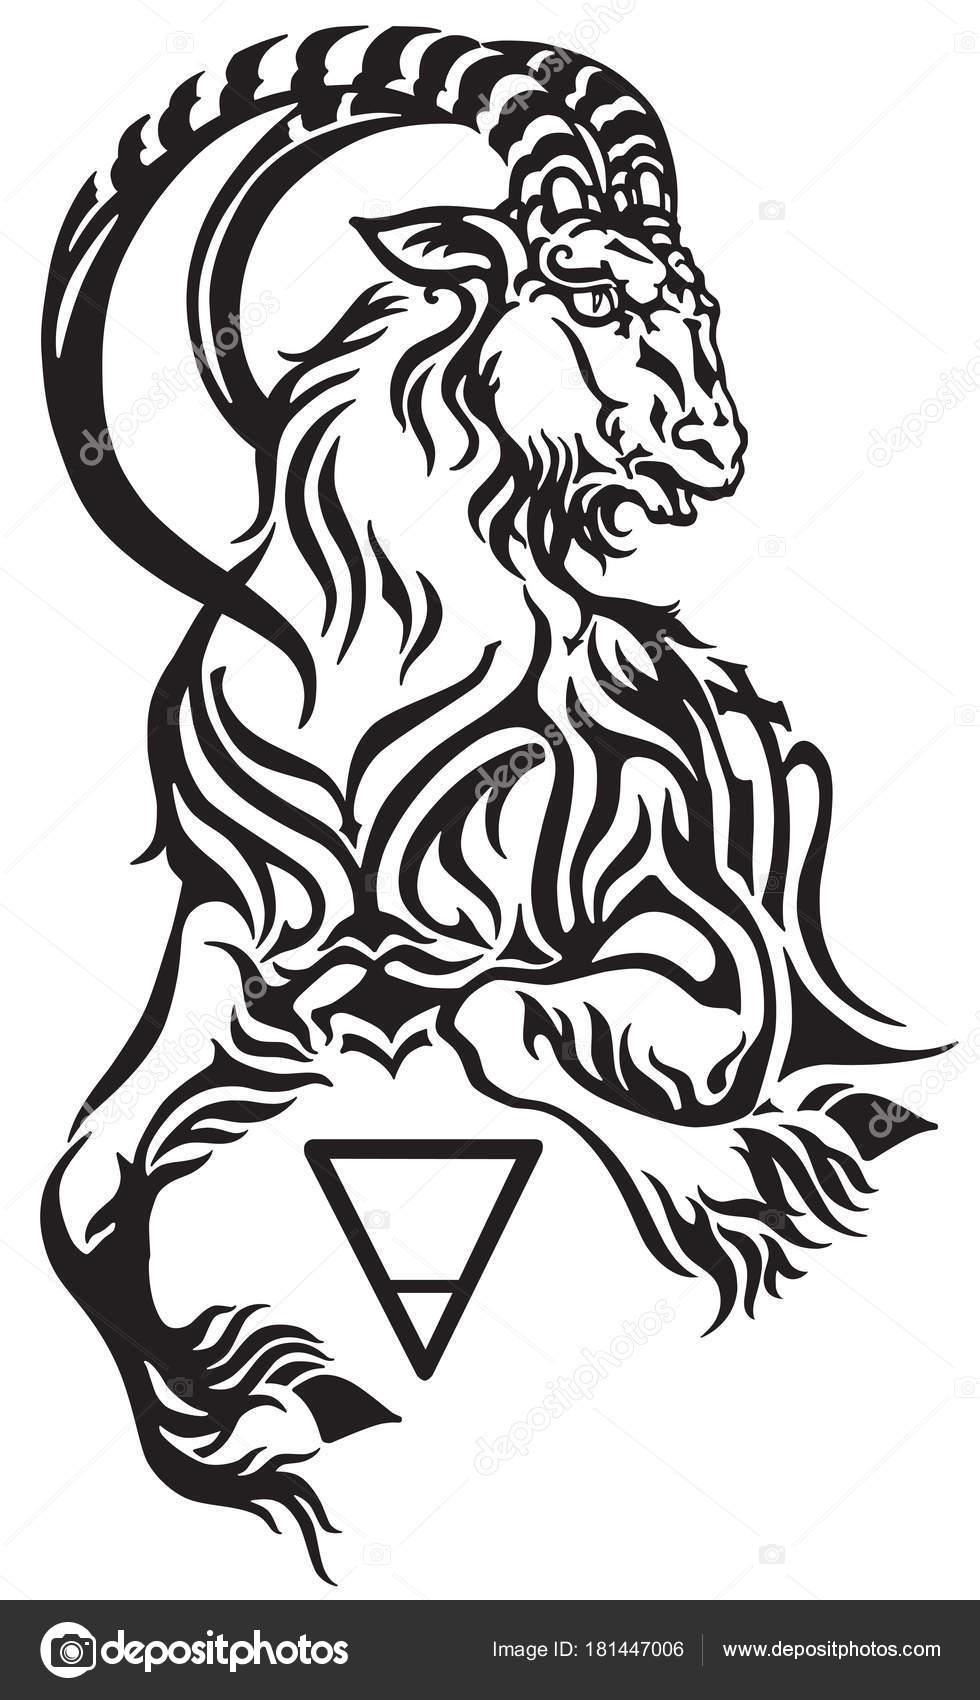 Характеристика знака зодиака стрелец совместимость.